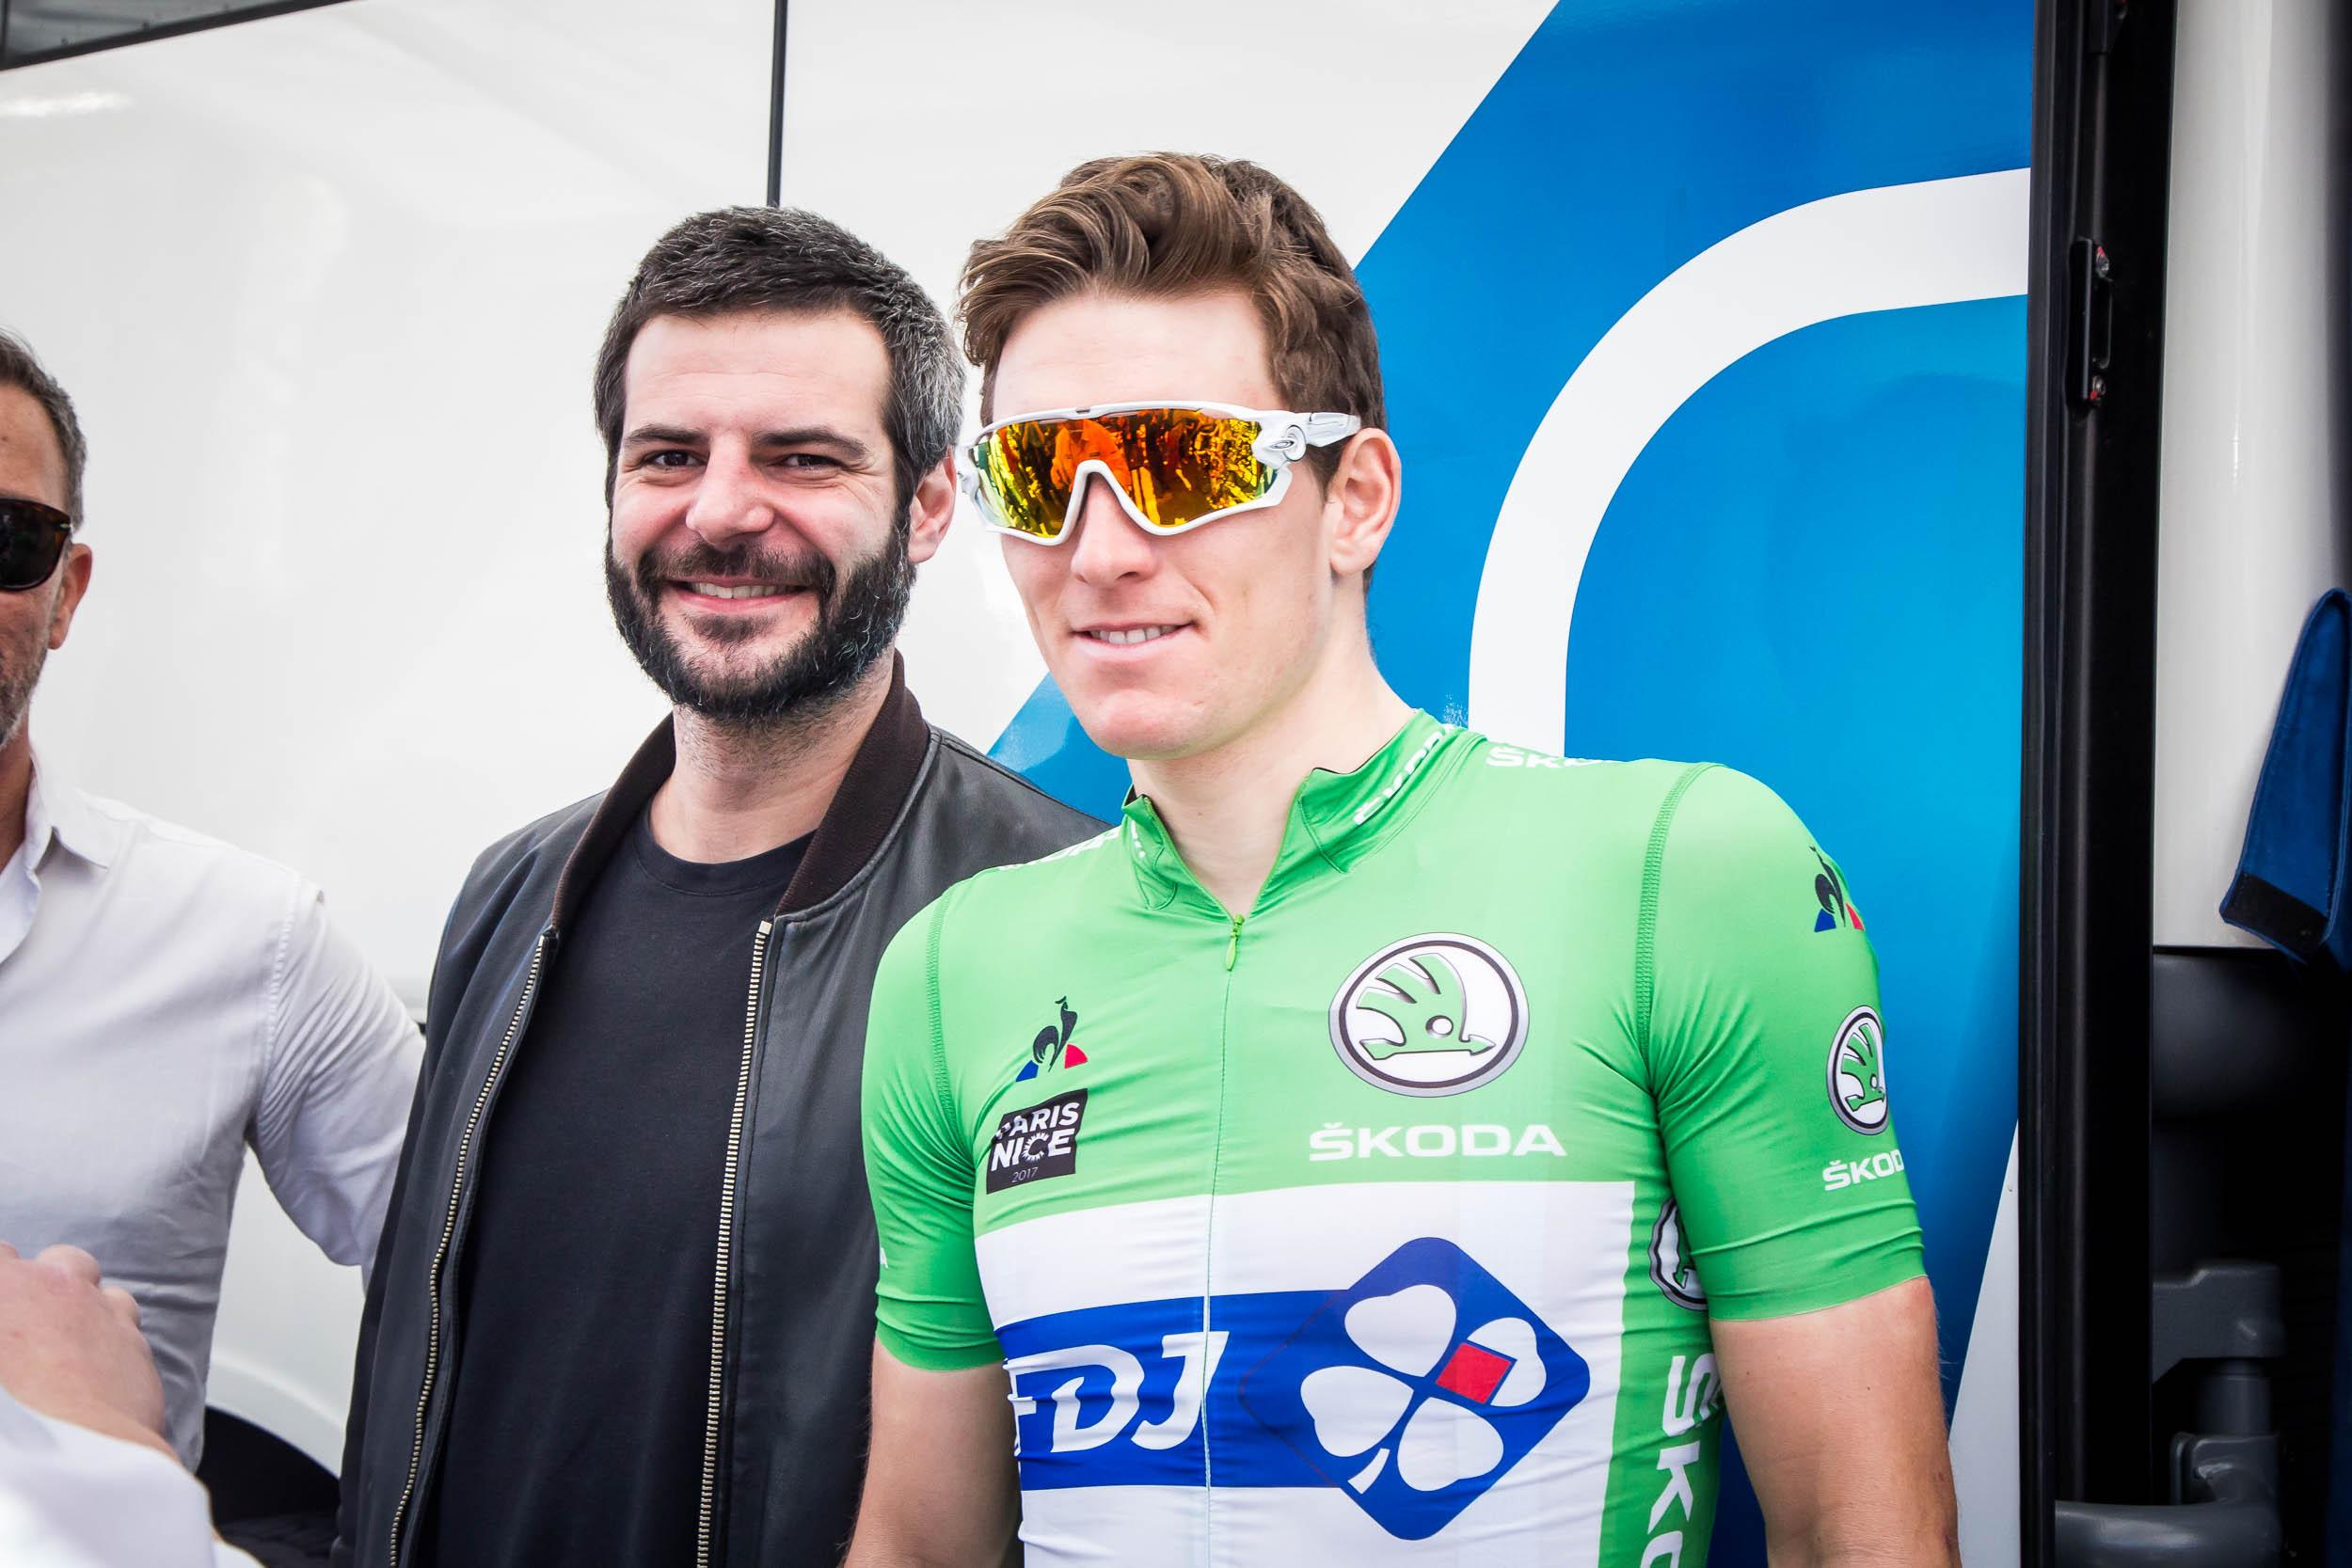 Pro Stage 6 Paris-Nice 2017 LR © Ivan Blanco Vilar-6111.jpg